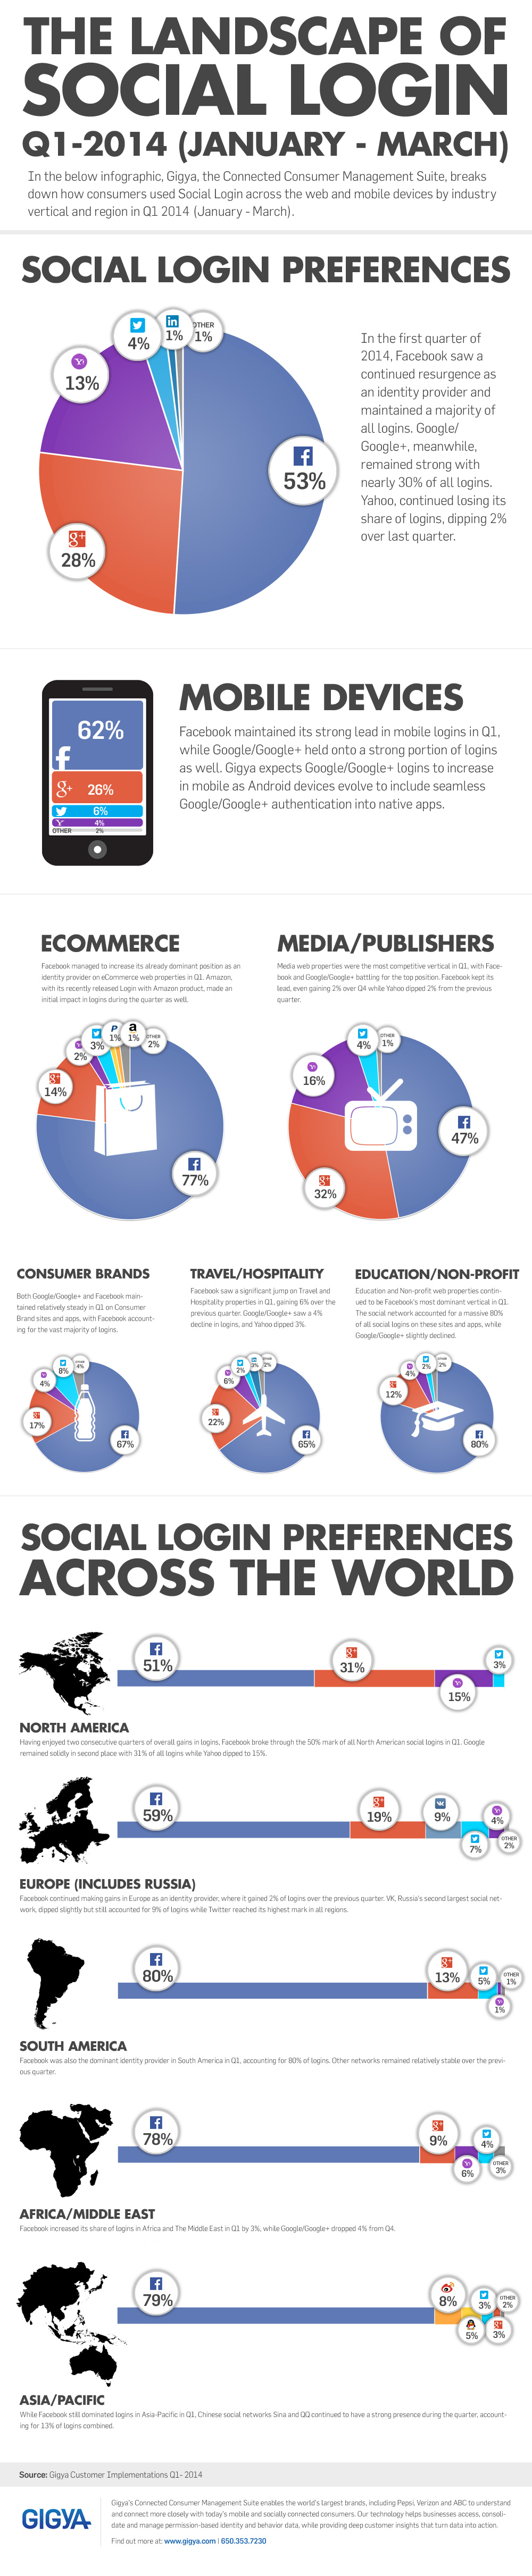 social-login-1er-cuarto-2014